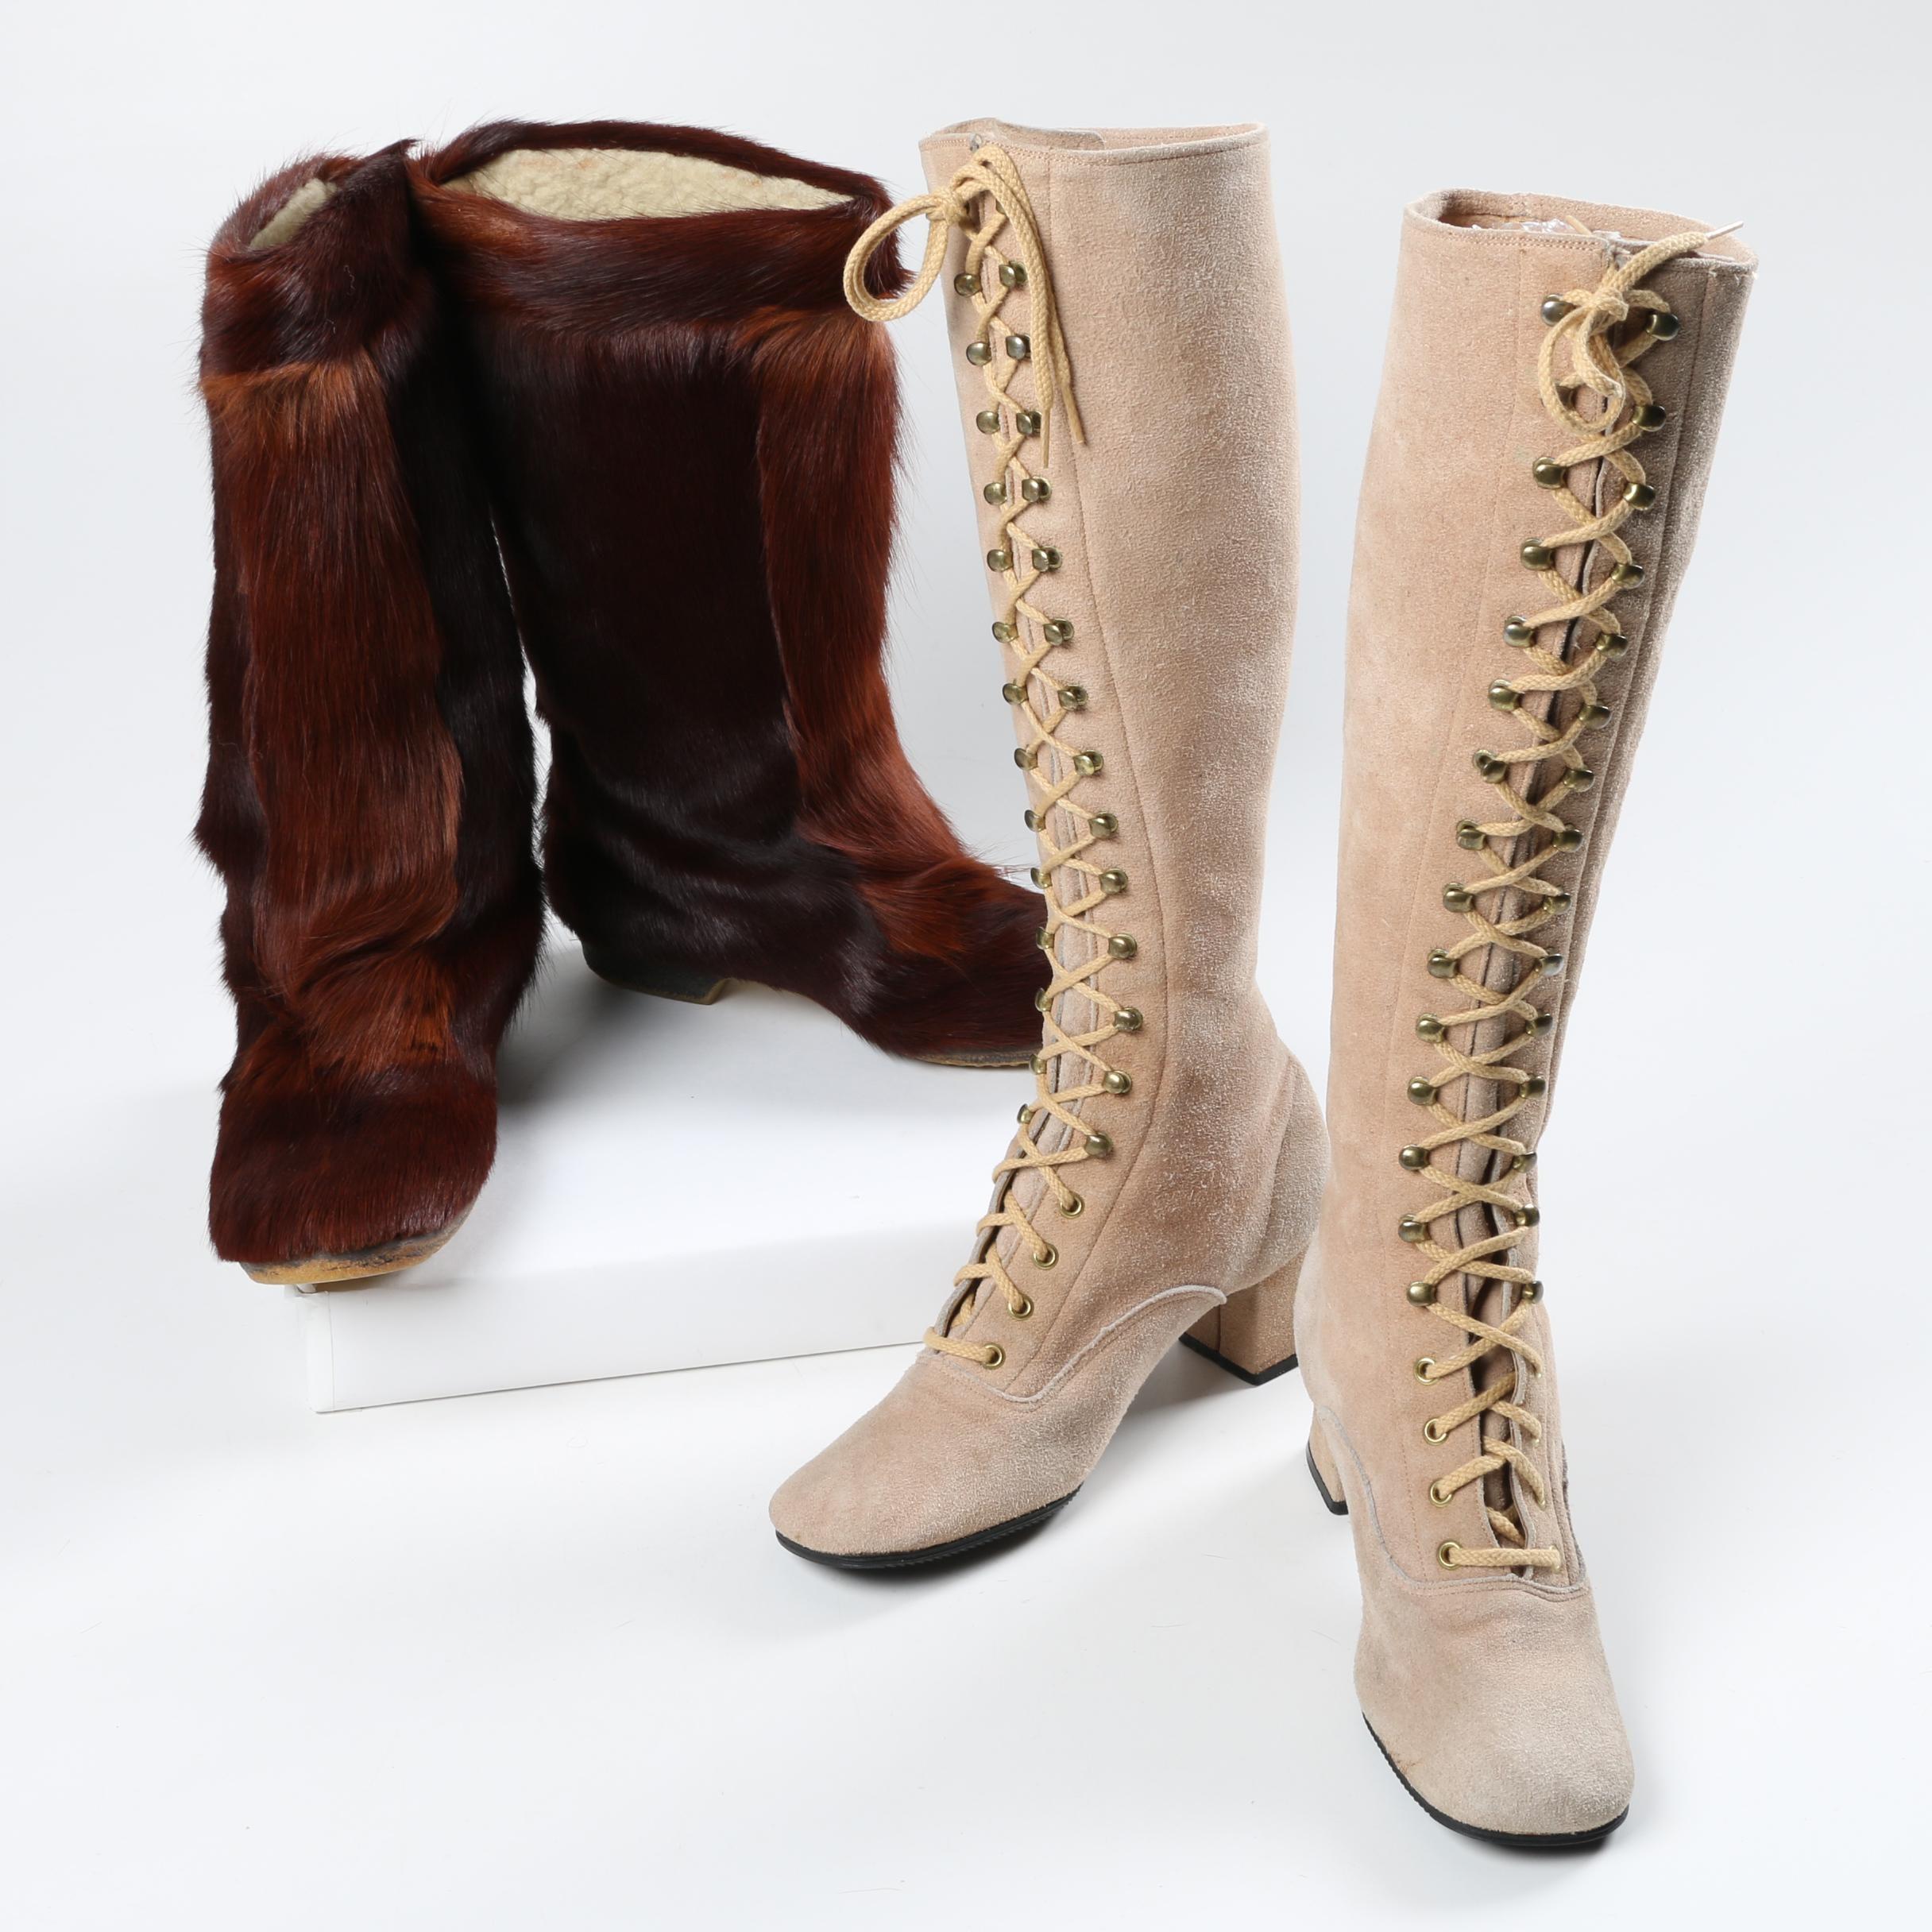 No. 6 Deanna Suede Lace Up Boots and Vintage Isba Goat Fur Après Ski Boots